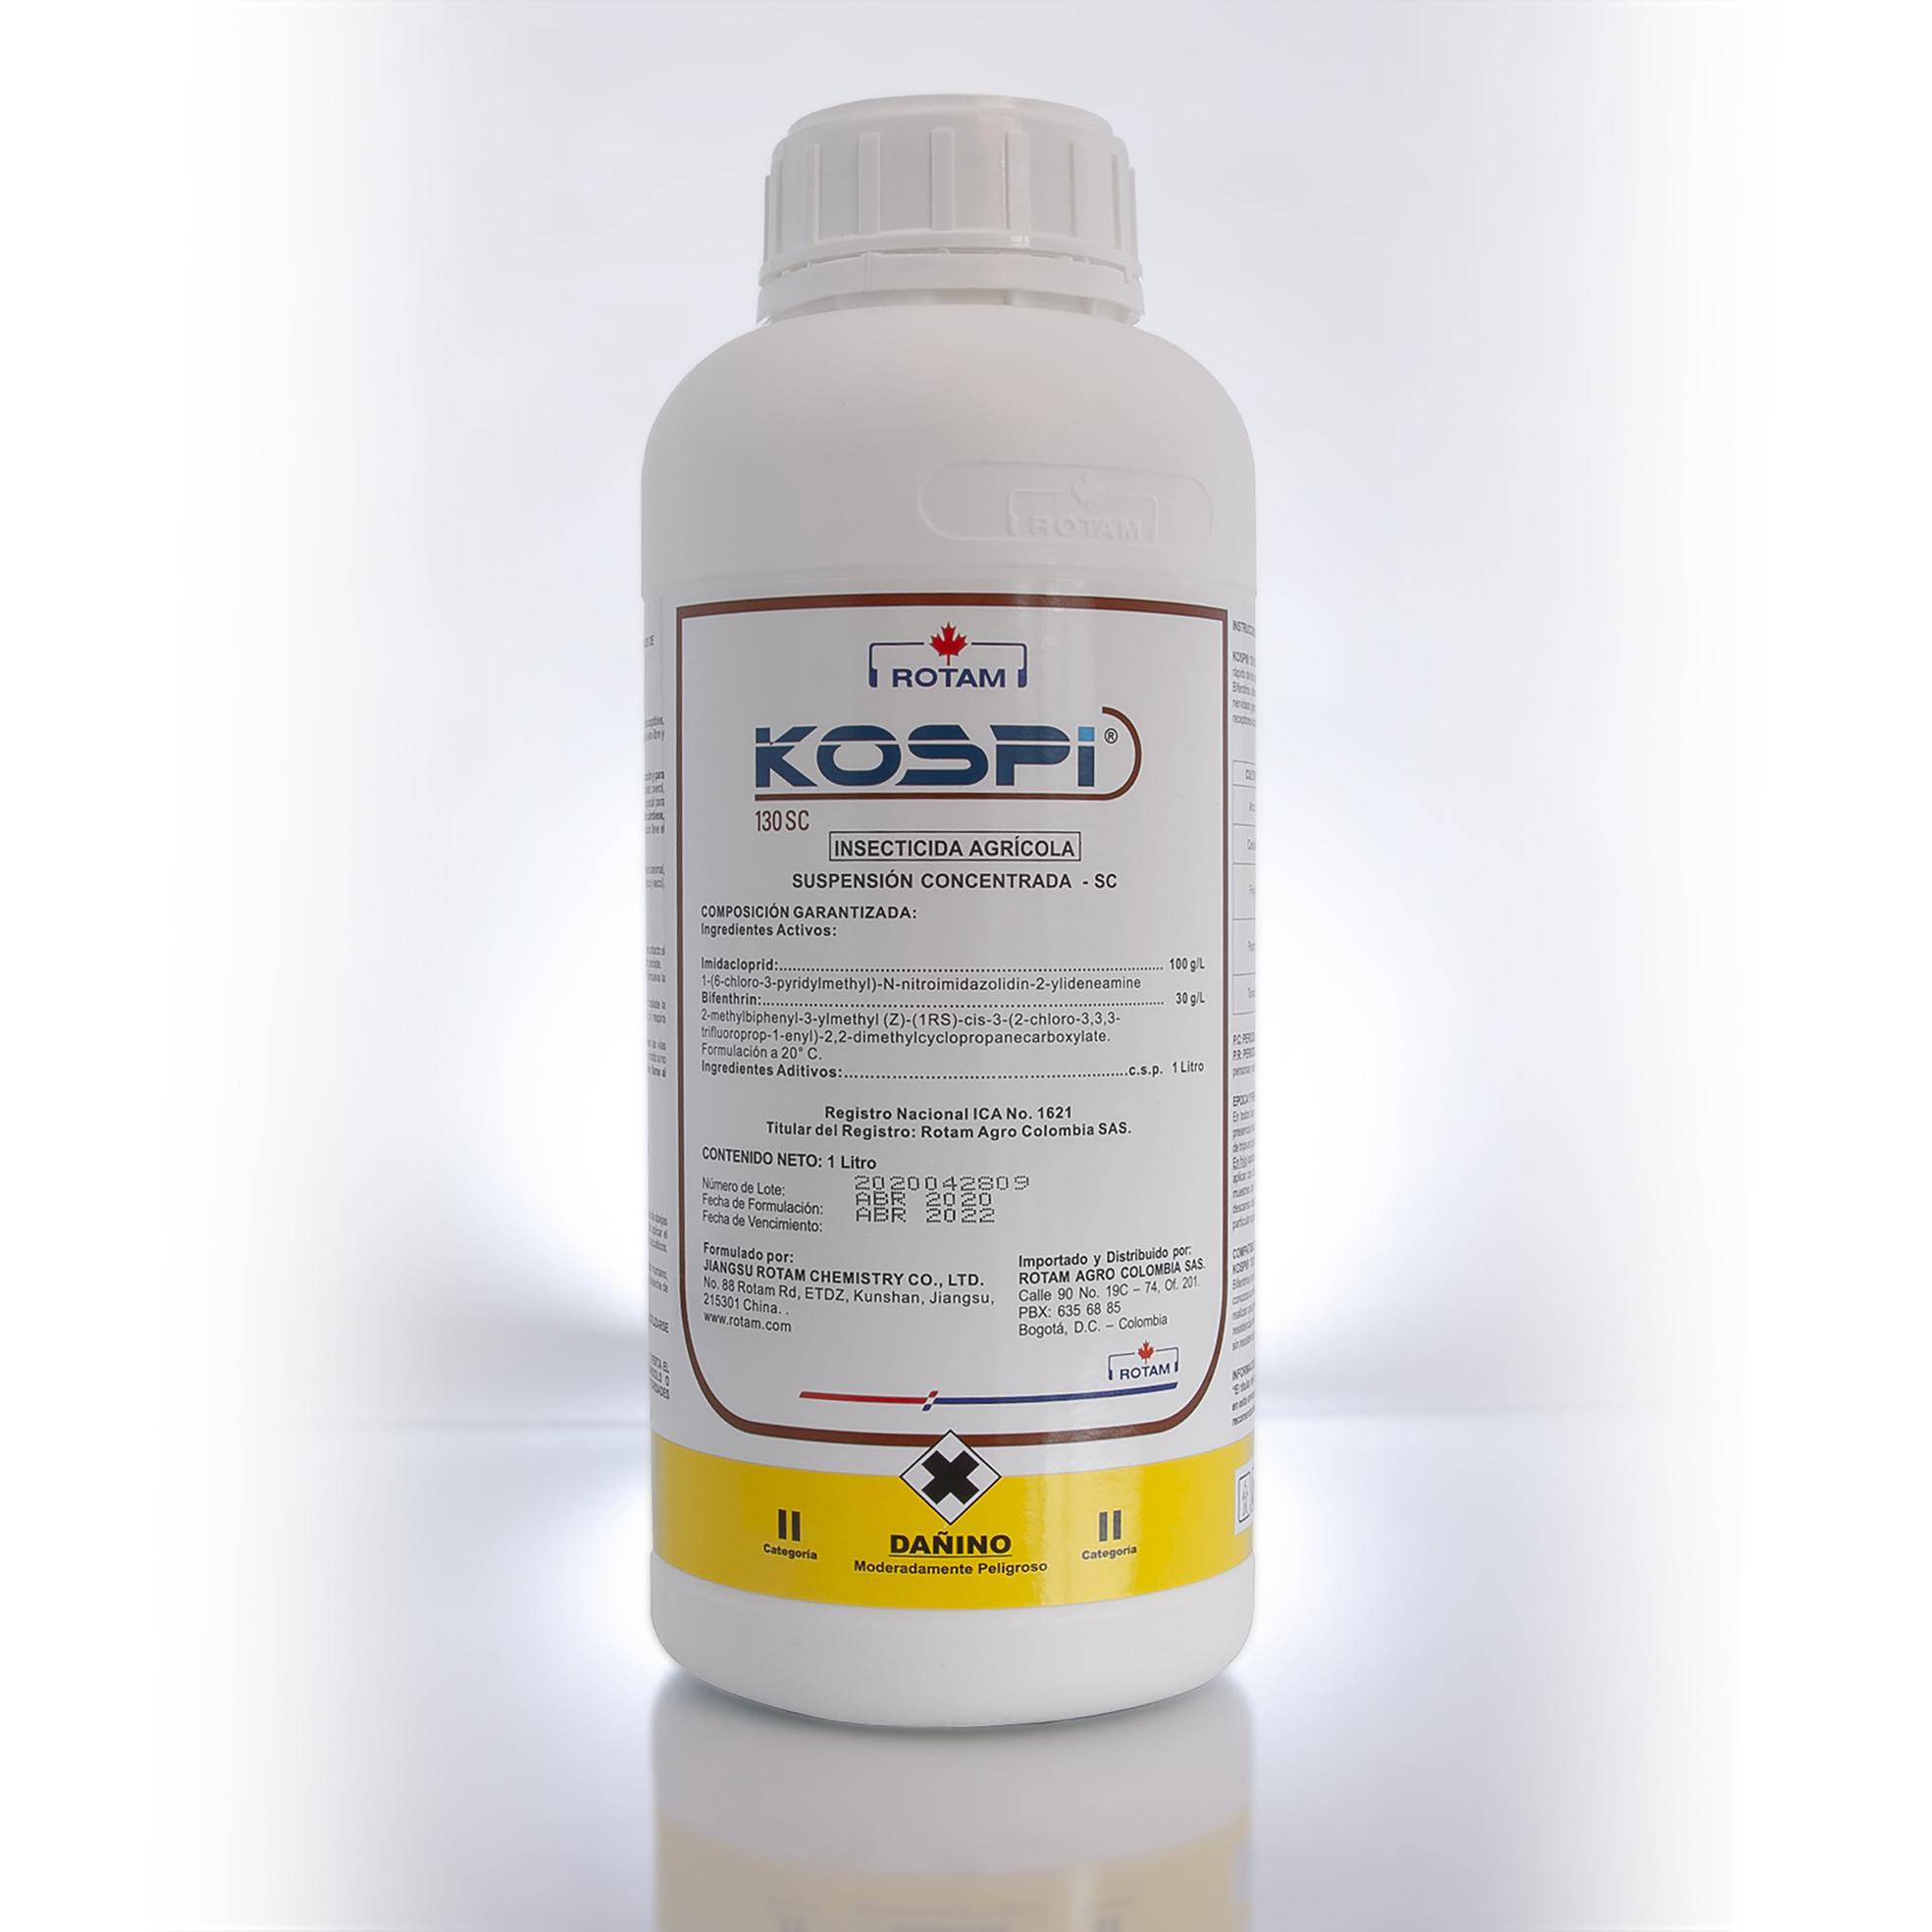 Insecticida-KOSPI-Rotam.jpg